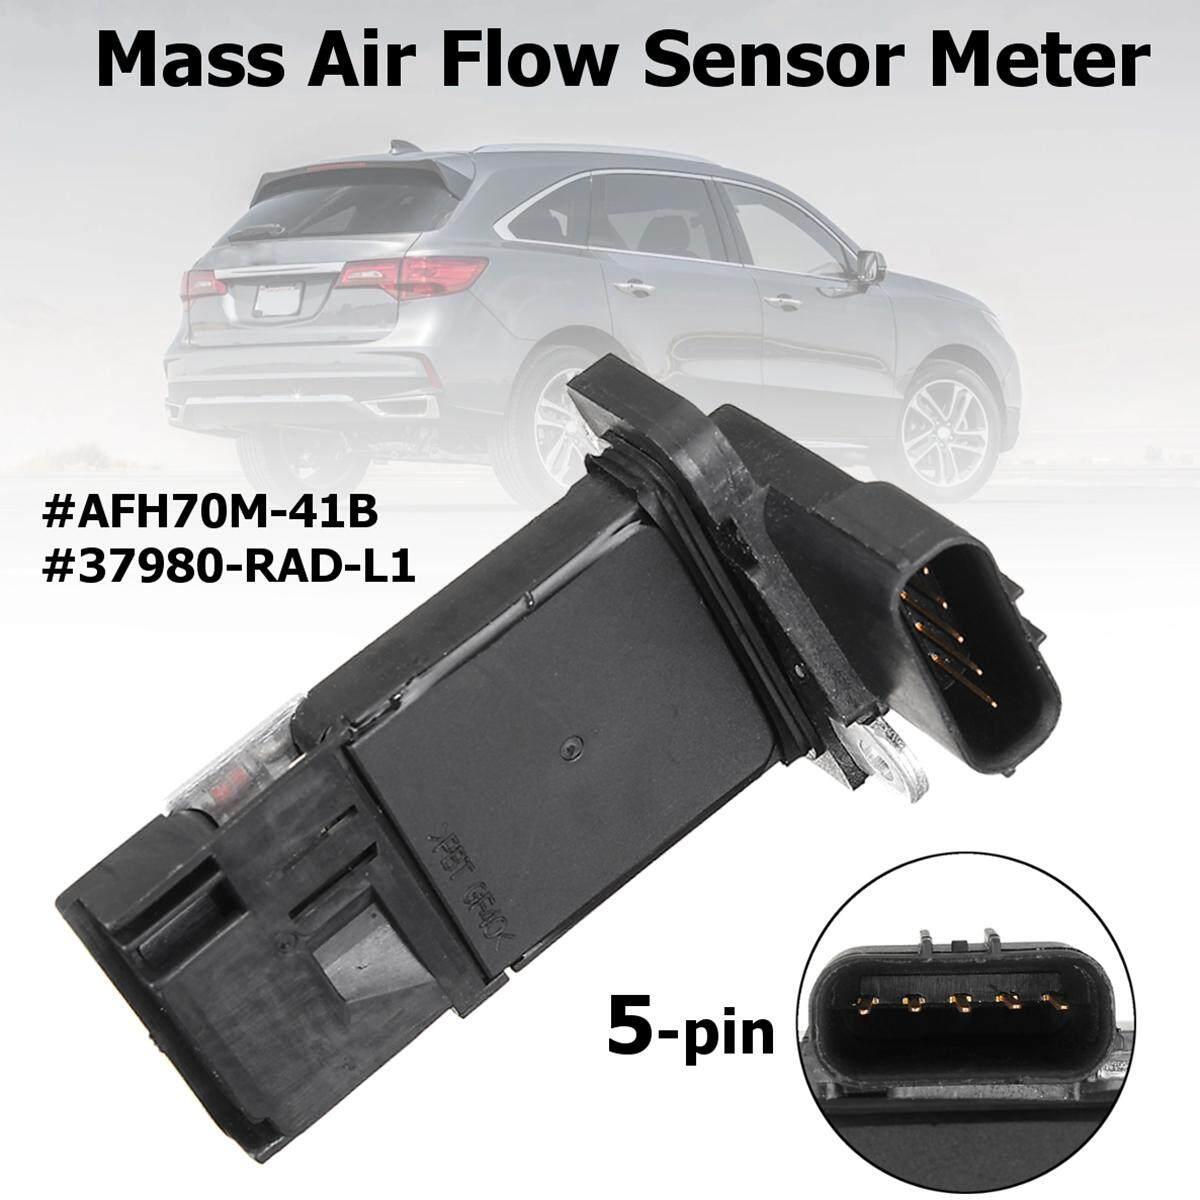 hight resolution of afh70m 41b mass air flow sensor meter maf for acura mdx rlx honda accord